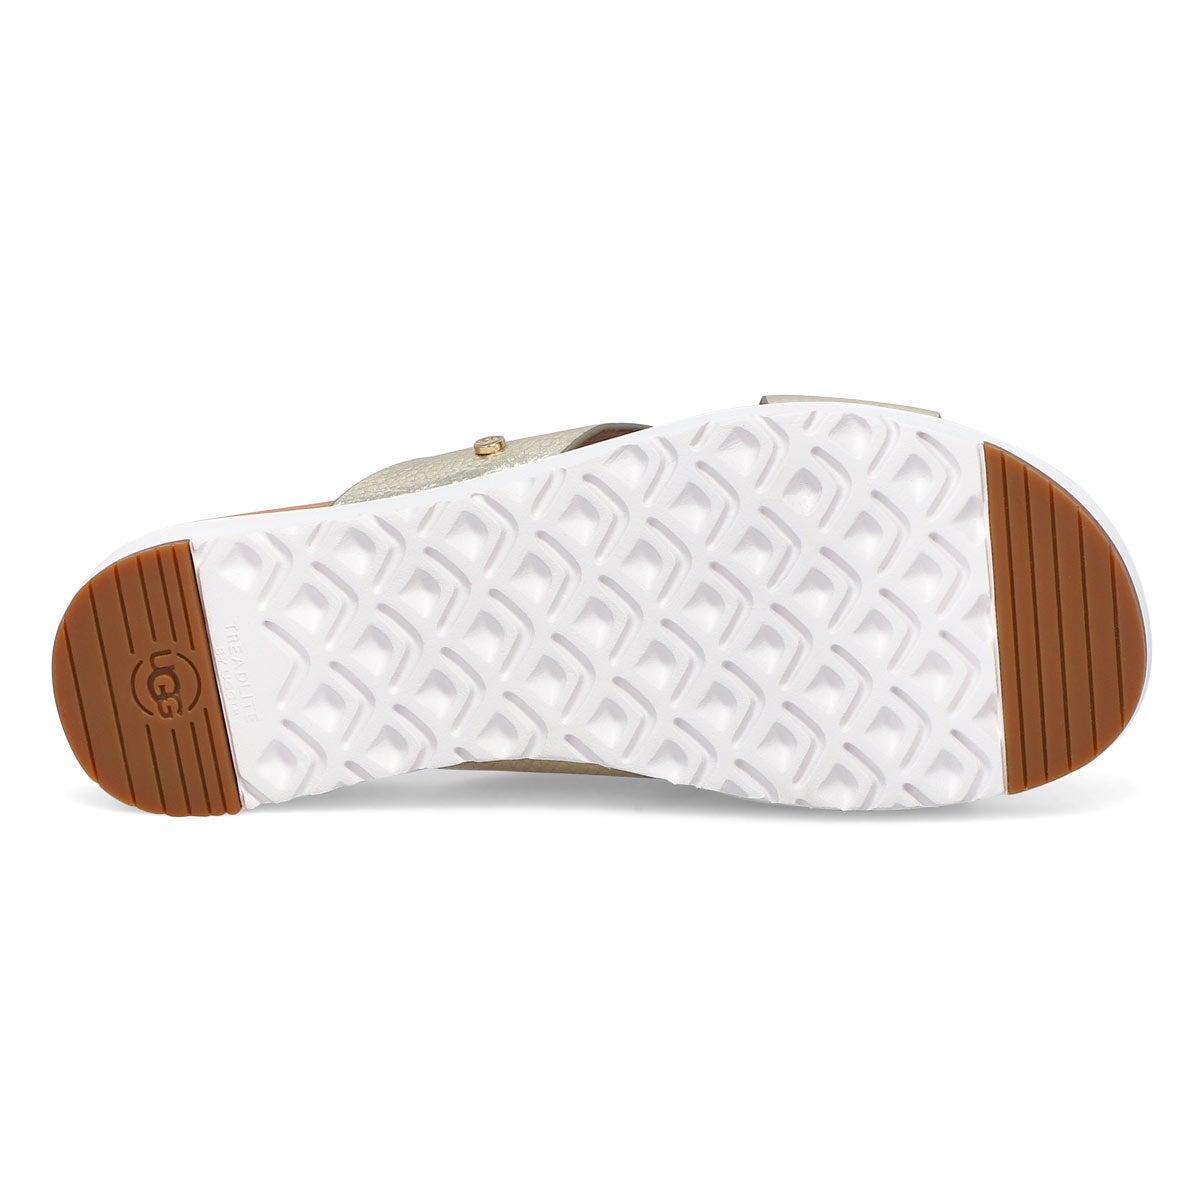 Women's Kari Slide Sandal - Metallic Gold